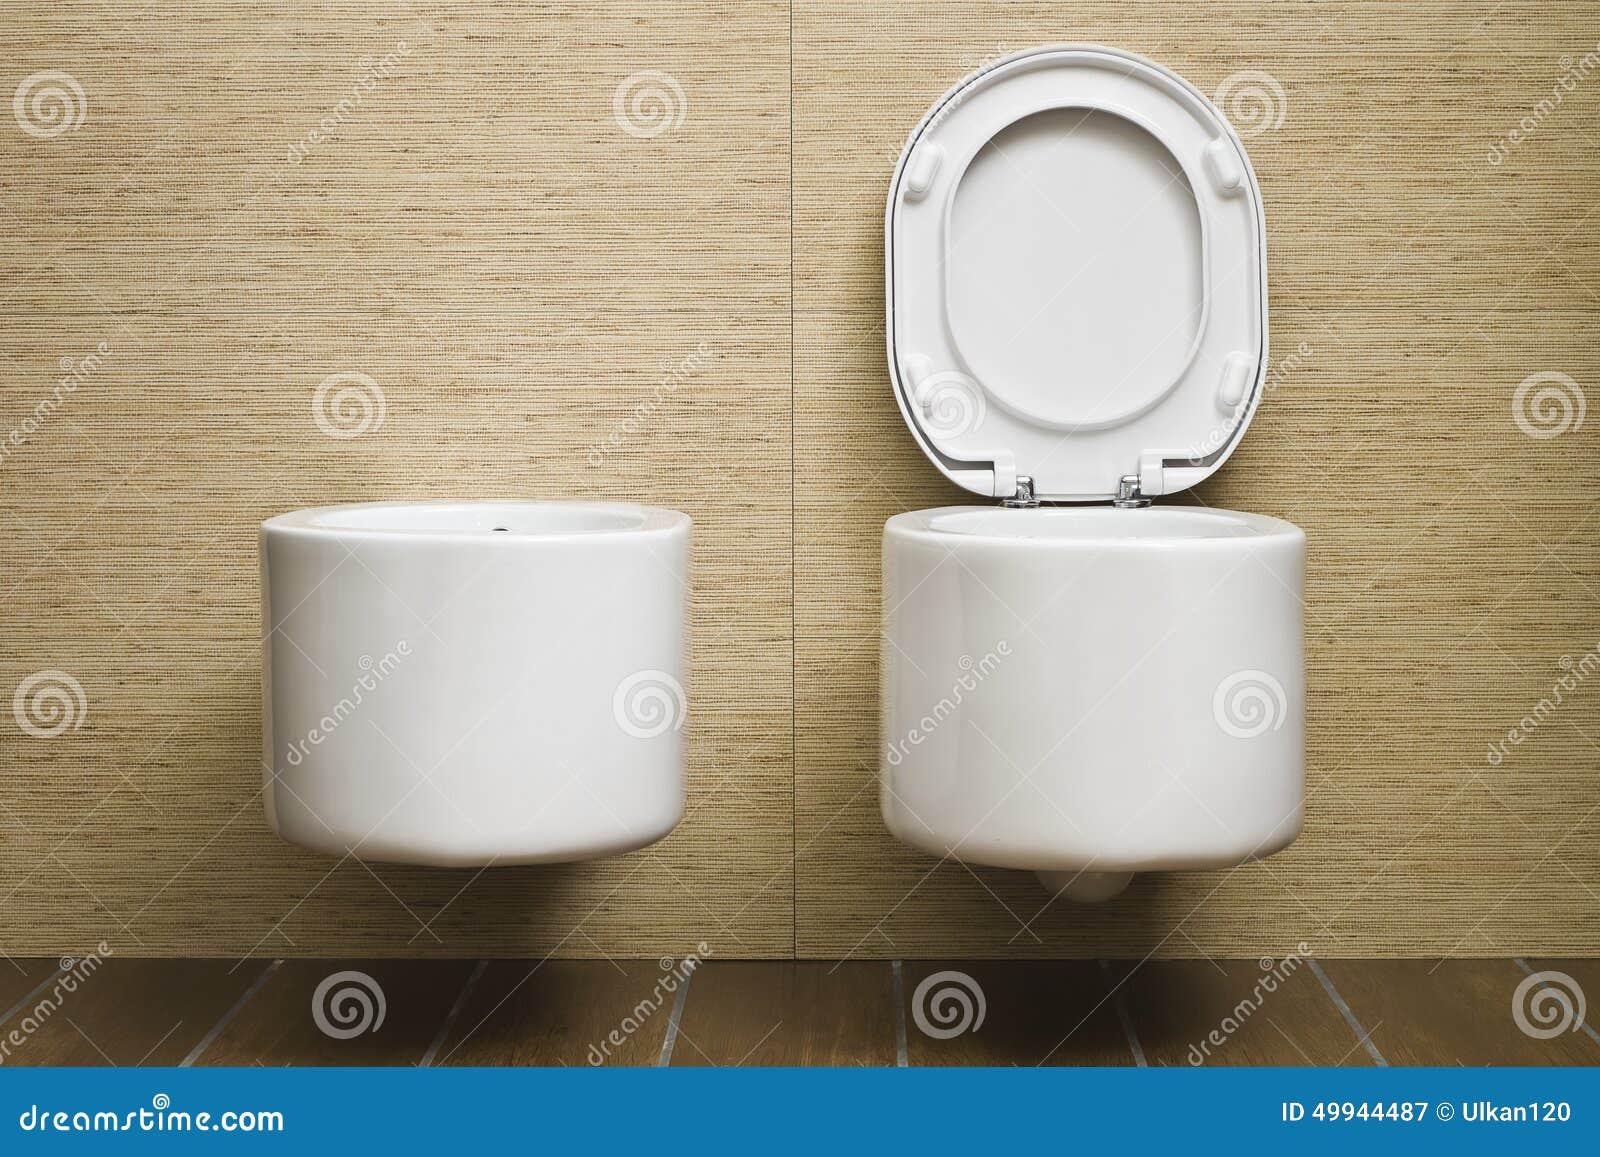 photo toilette moderne alene workman ocean penthouse by alene workman design table de toilette. Black Bedroom Furniture Sets. Home Design Ideas